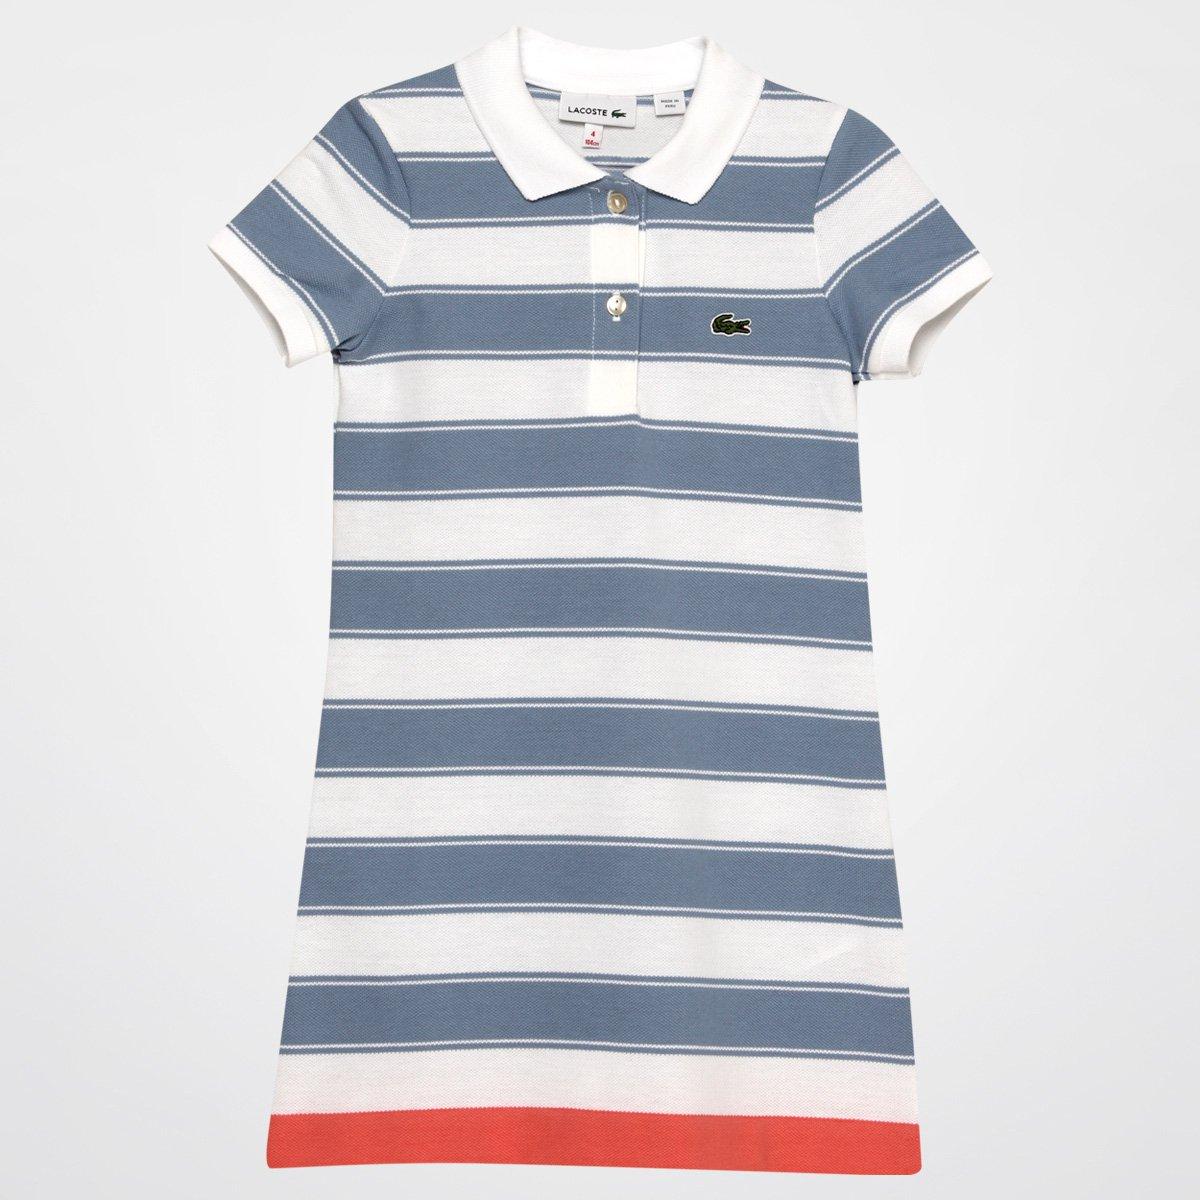 0ebd20f8797d4 Vestido Lacoste Infantil - Compre Agora